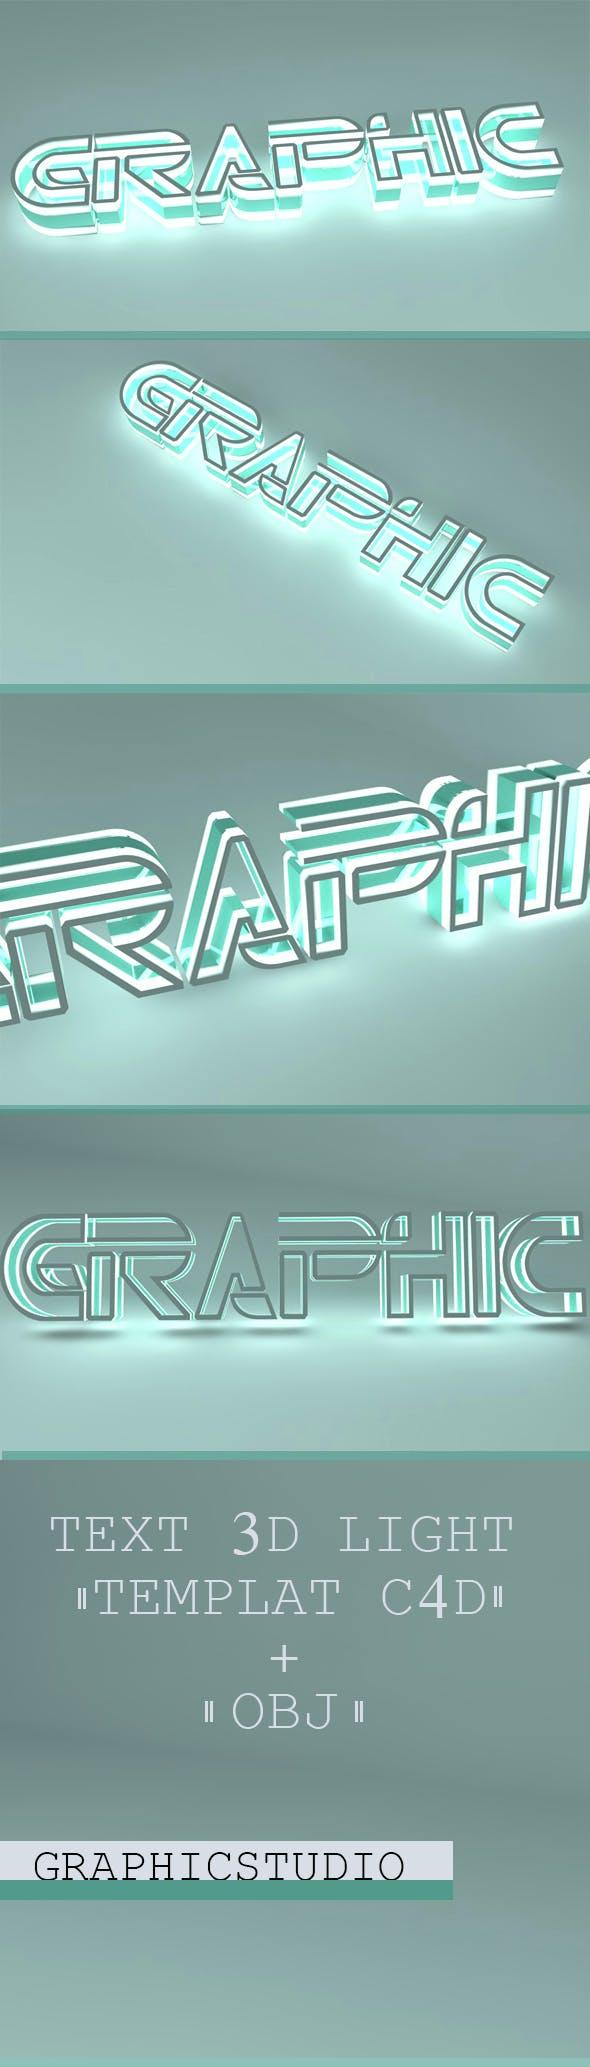 Text 3d Light - 3DOcean Item for Sale